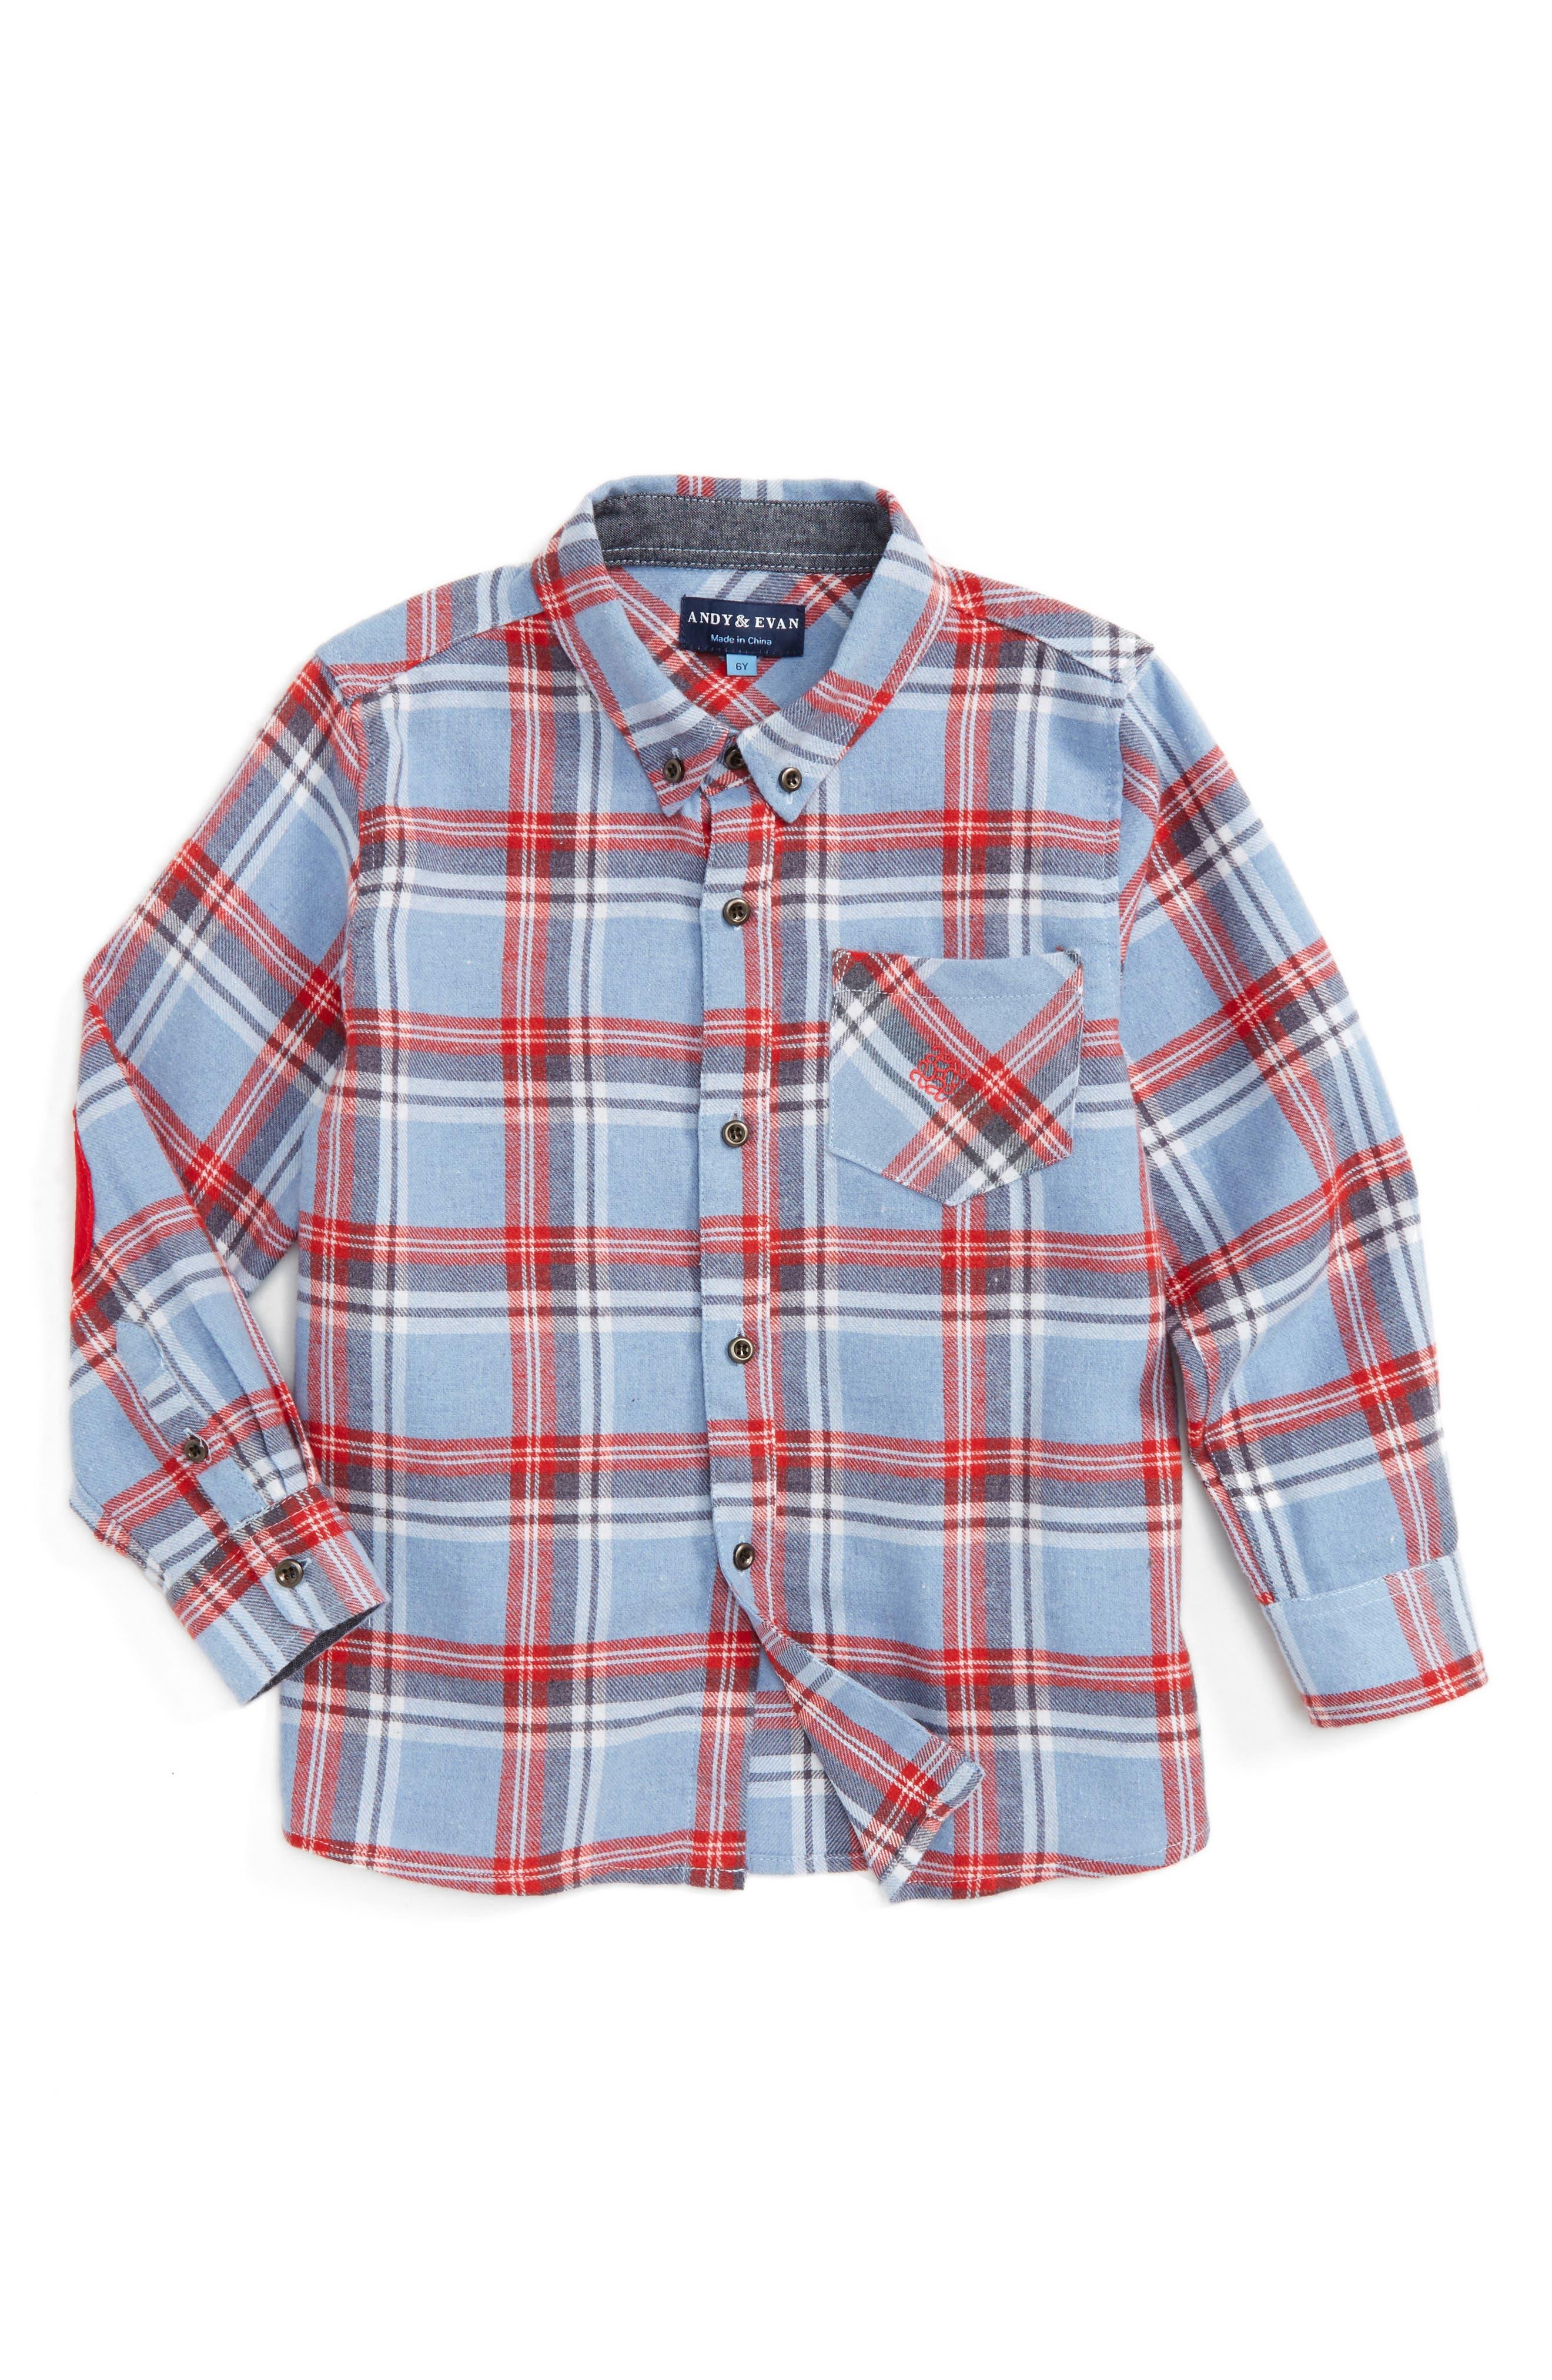 Andy & Evan Plaid Flannel Shirt (Toddler Boys & Little Boys)